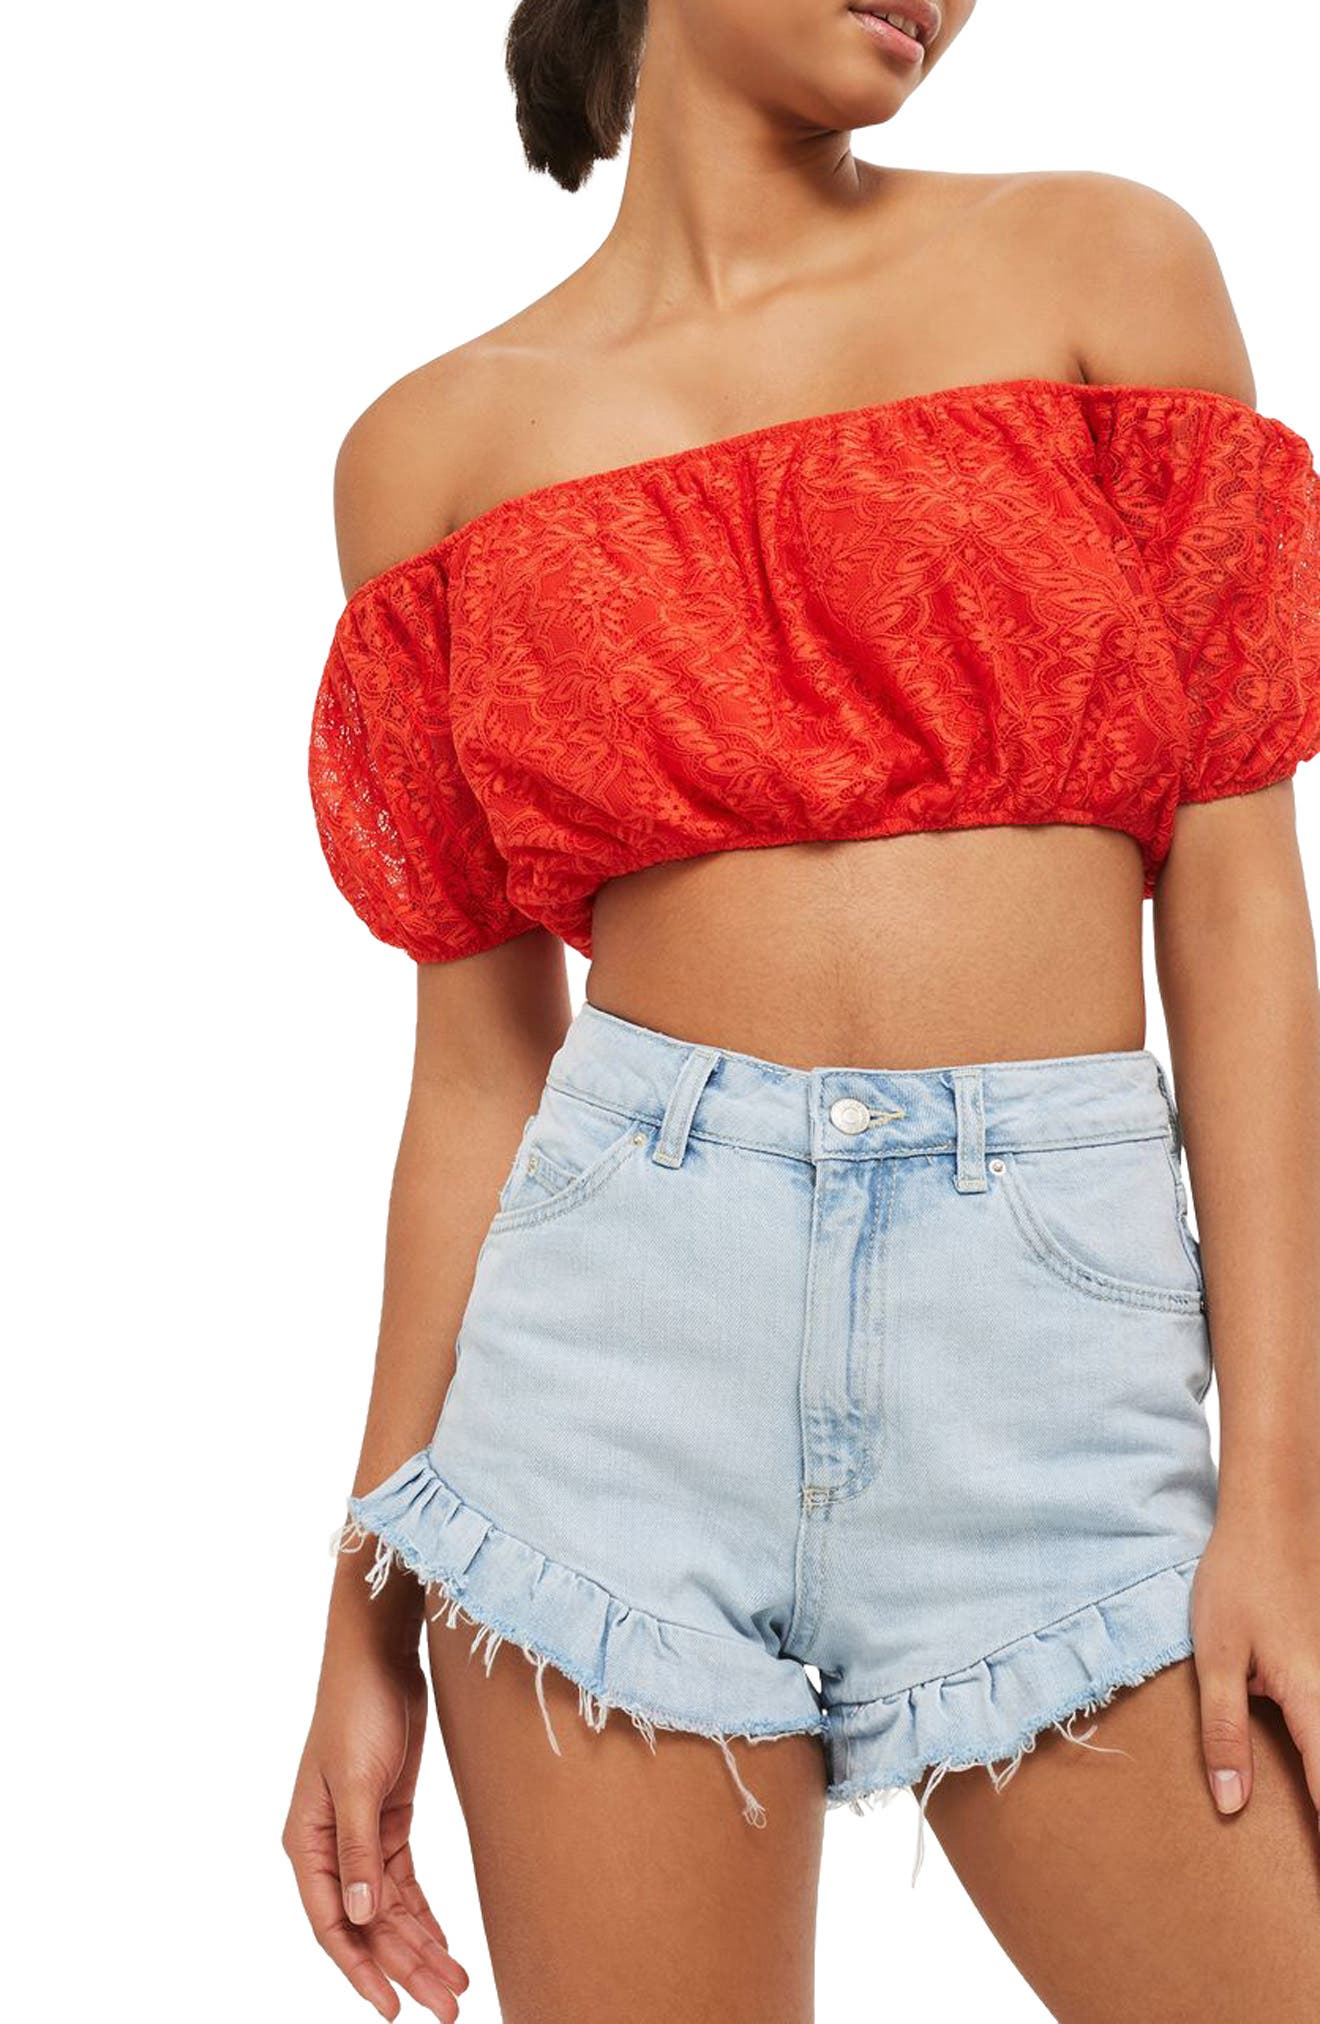 Topshop Lace Off the Shoulder Crop Top